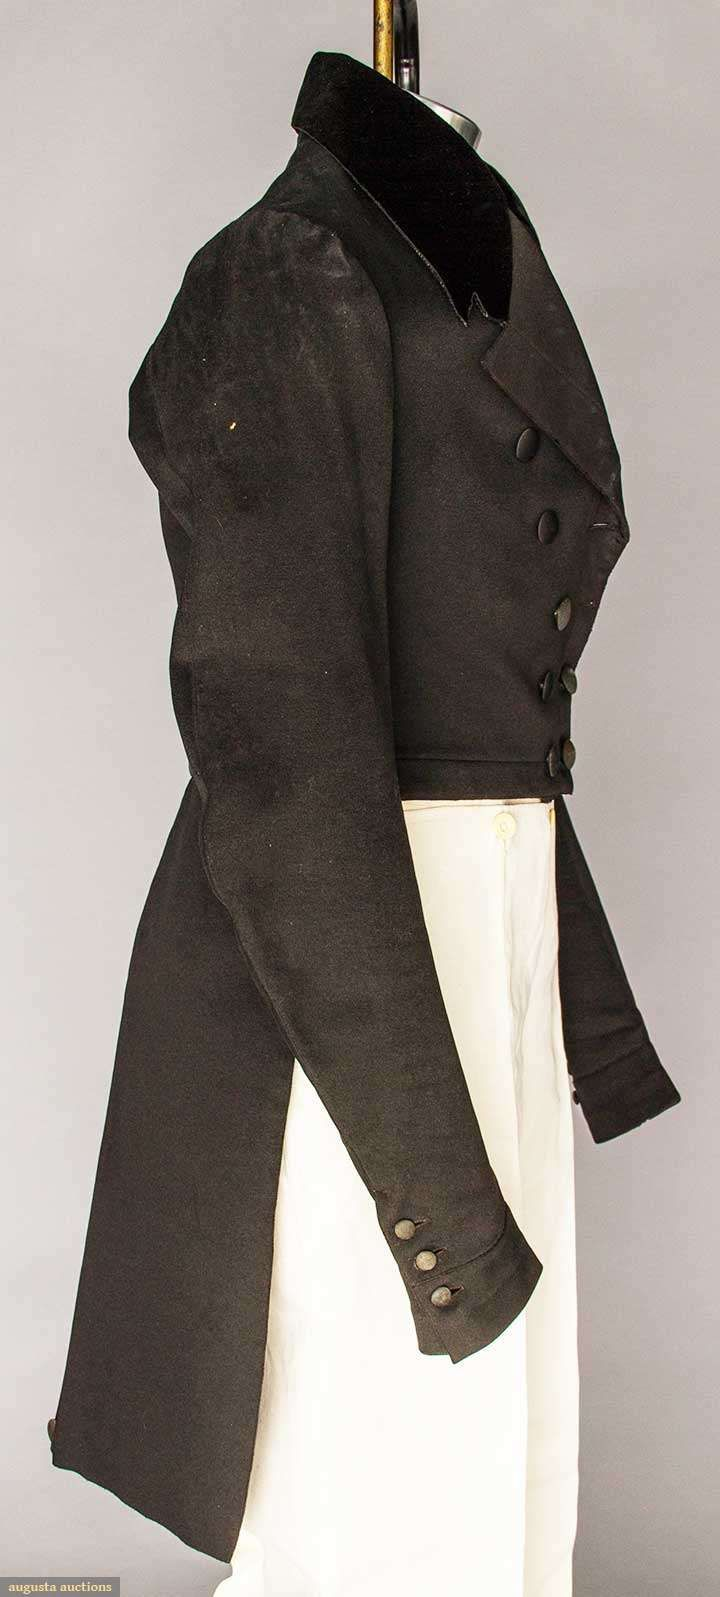 Tail Coat (image 2) | 1840 | wool, velvet | Augusta Auctions | April 20, 2016/Lot 175